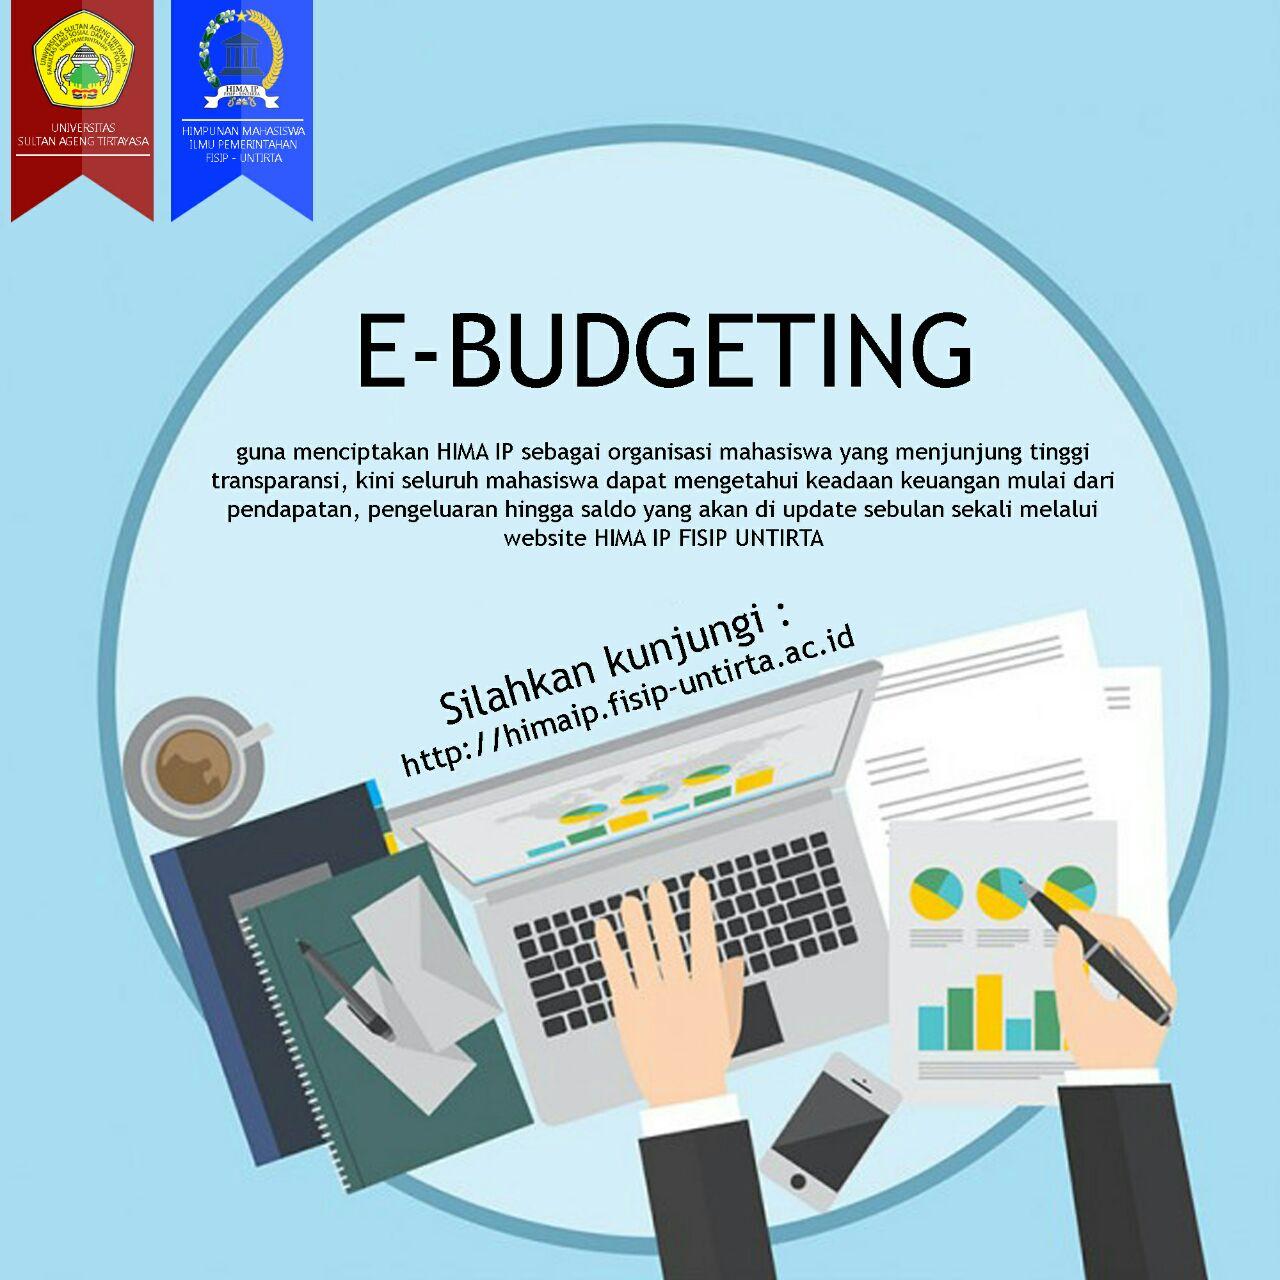 Teori Lengkap E-Budgeting menurut Para Ahli dan Contoh Tesis E-Budgeting